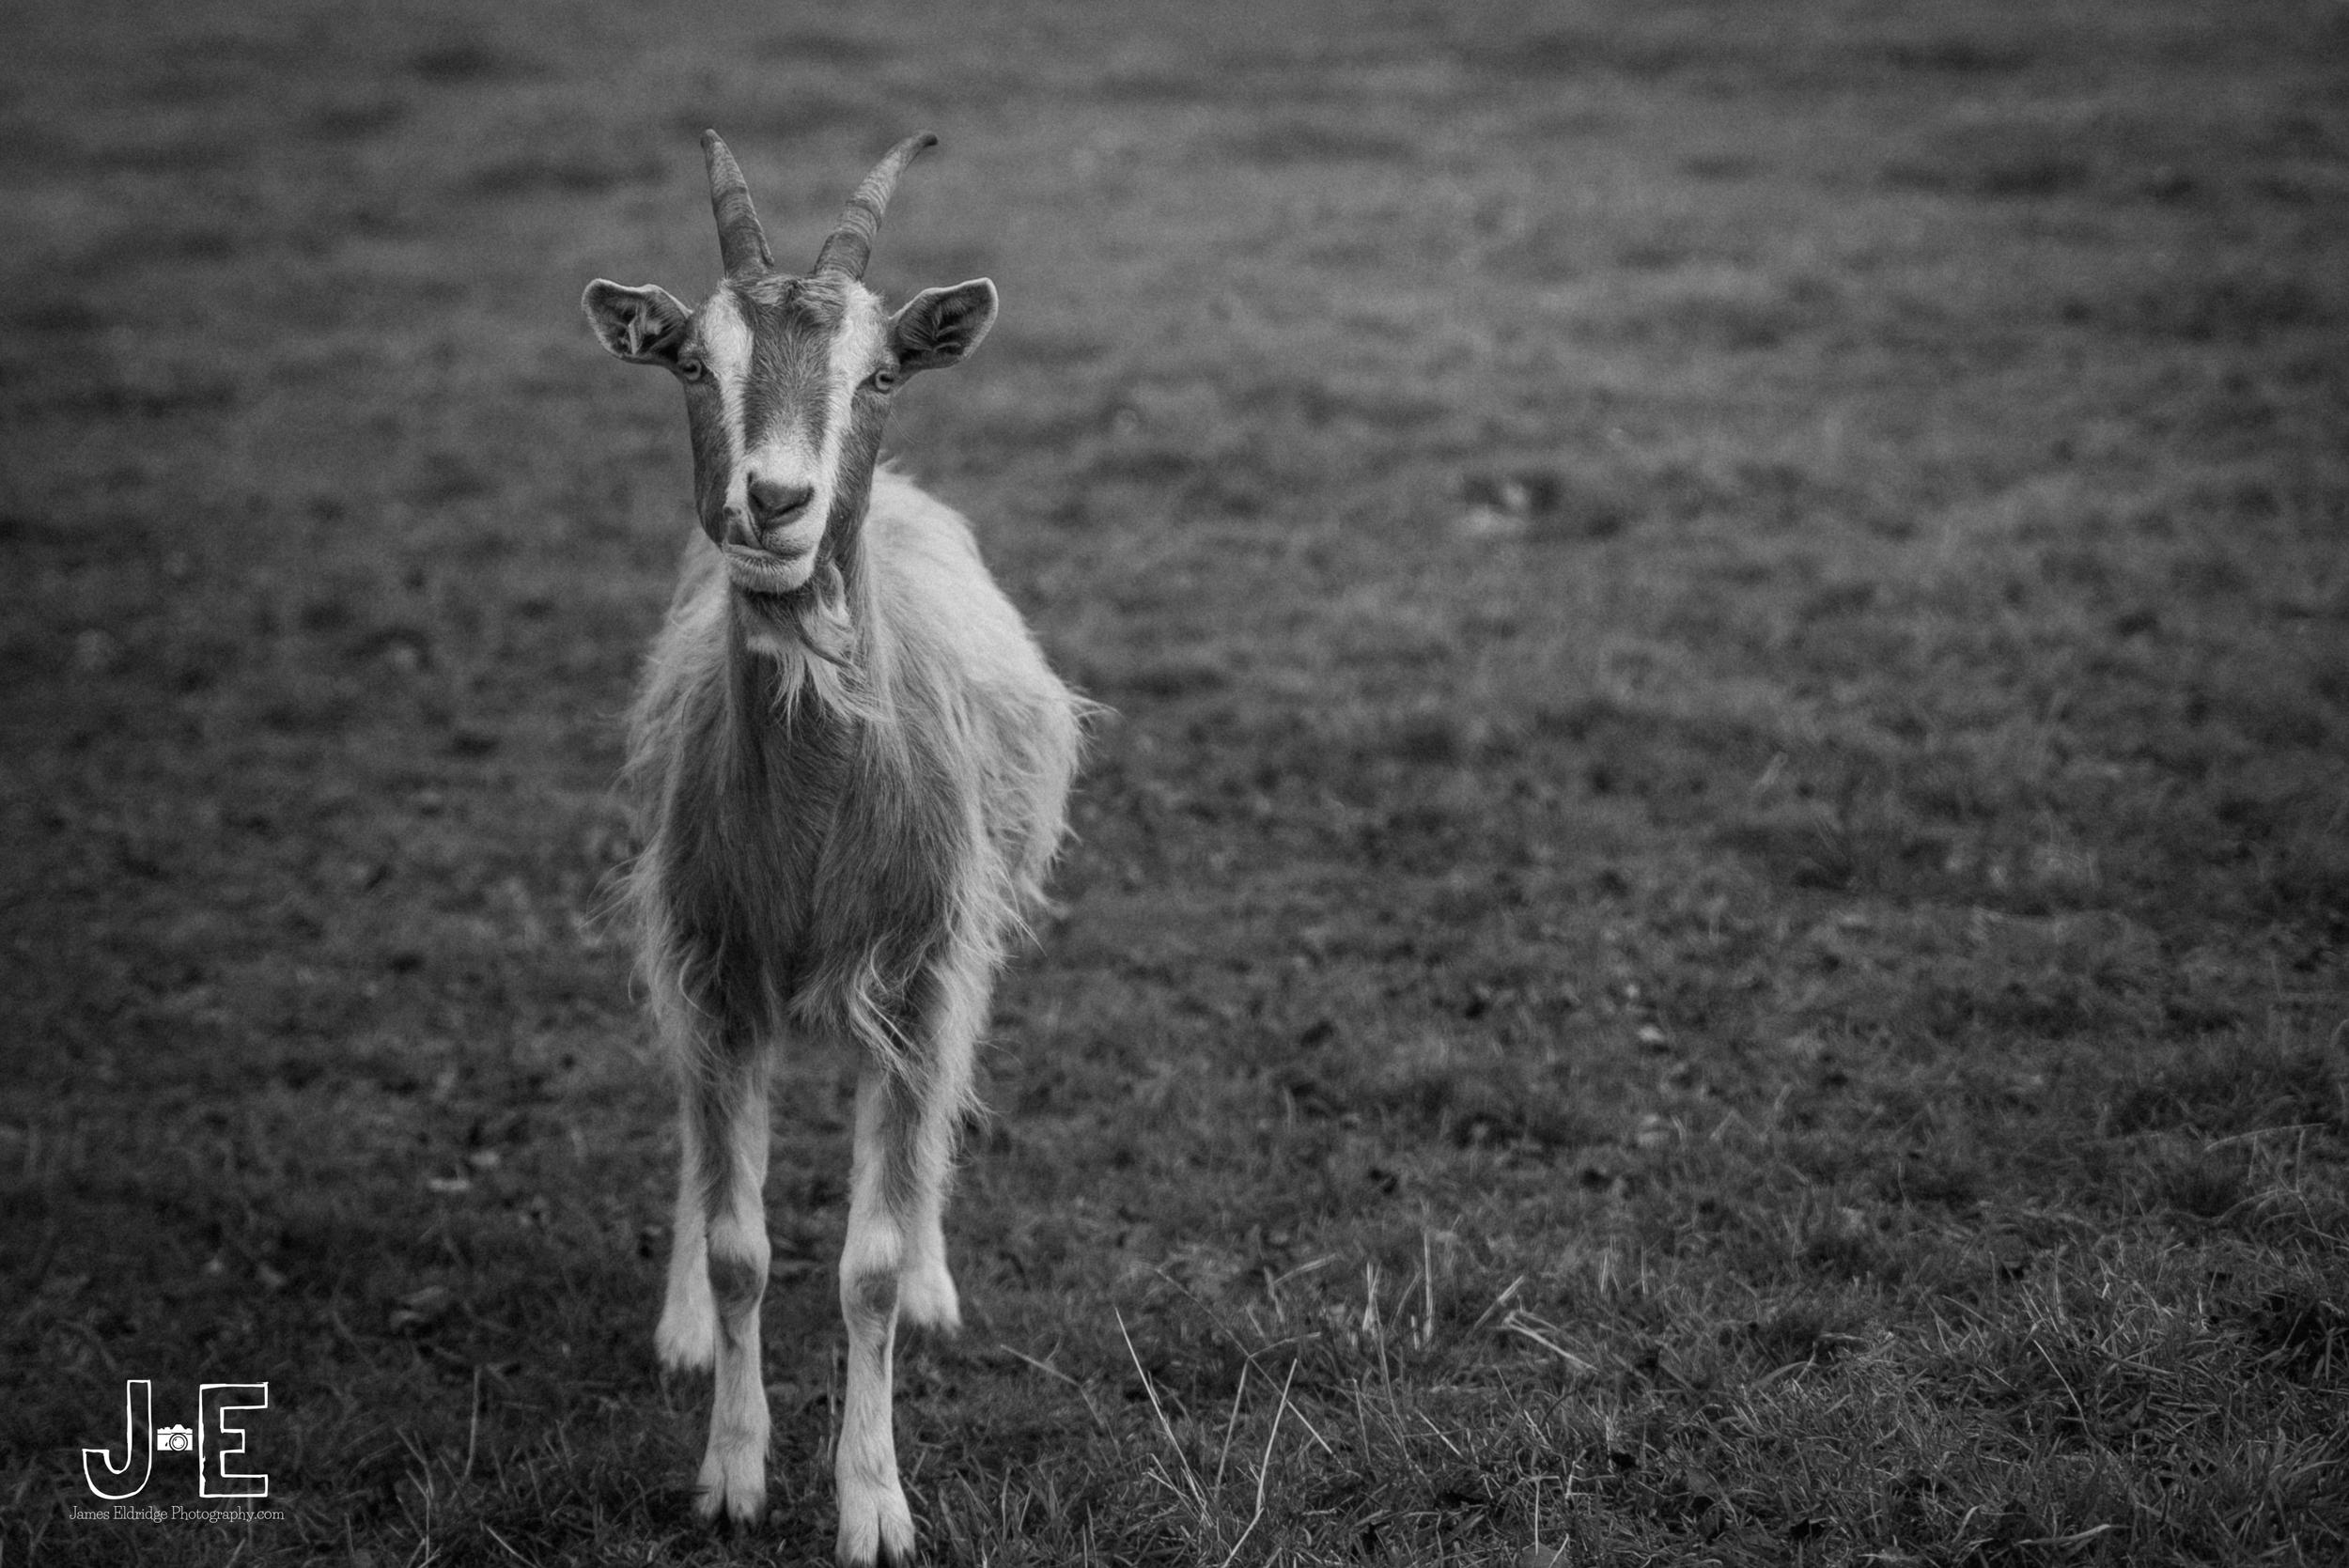 Goat street photography